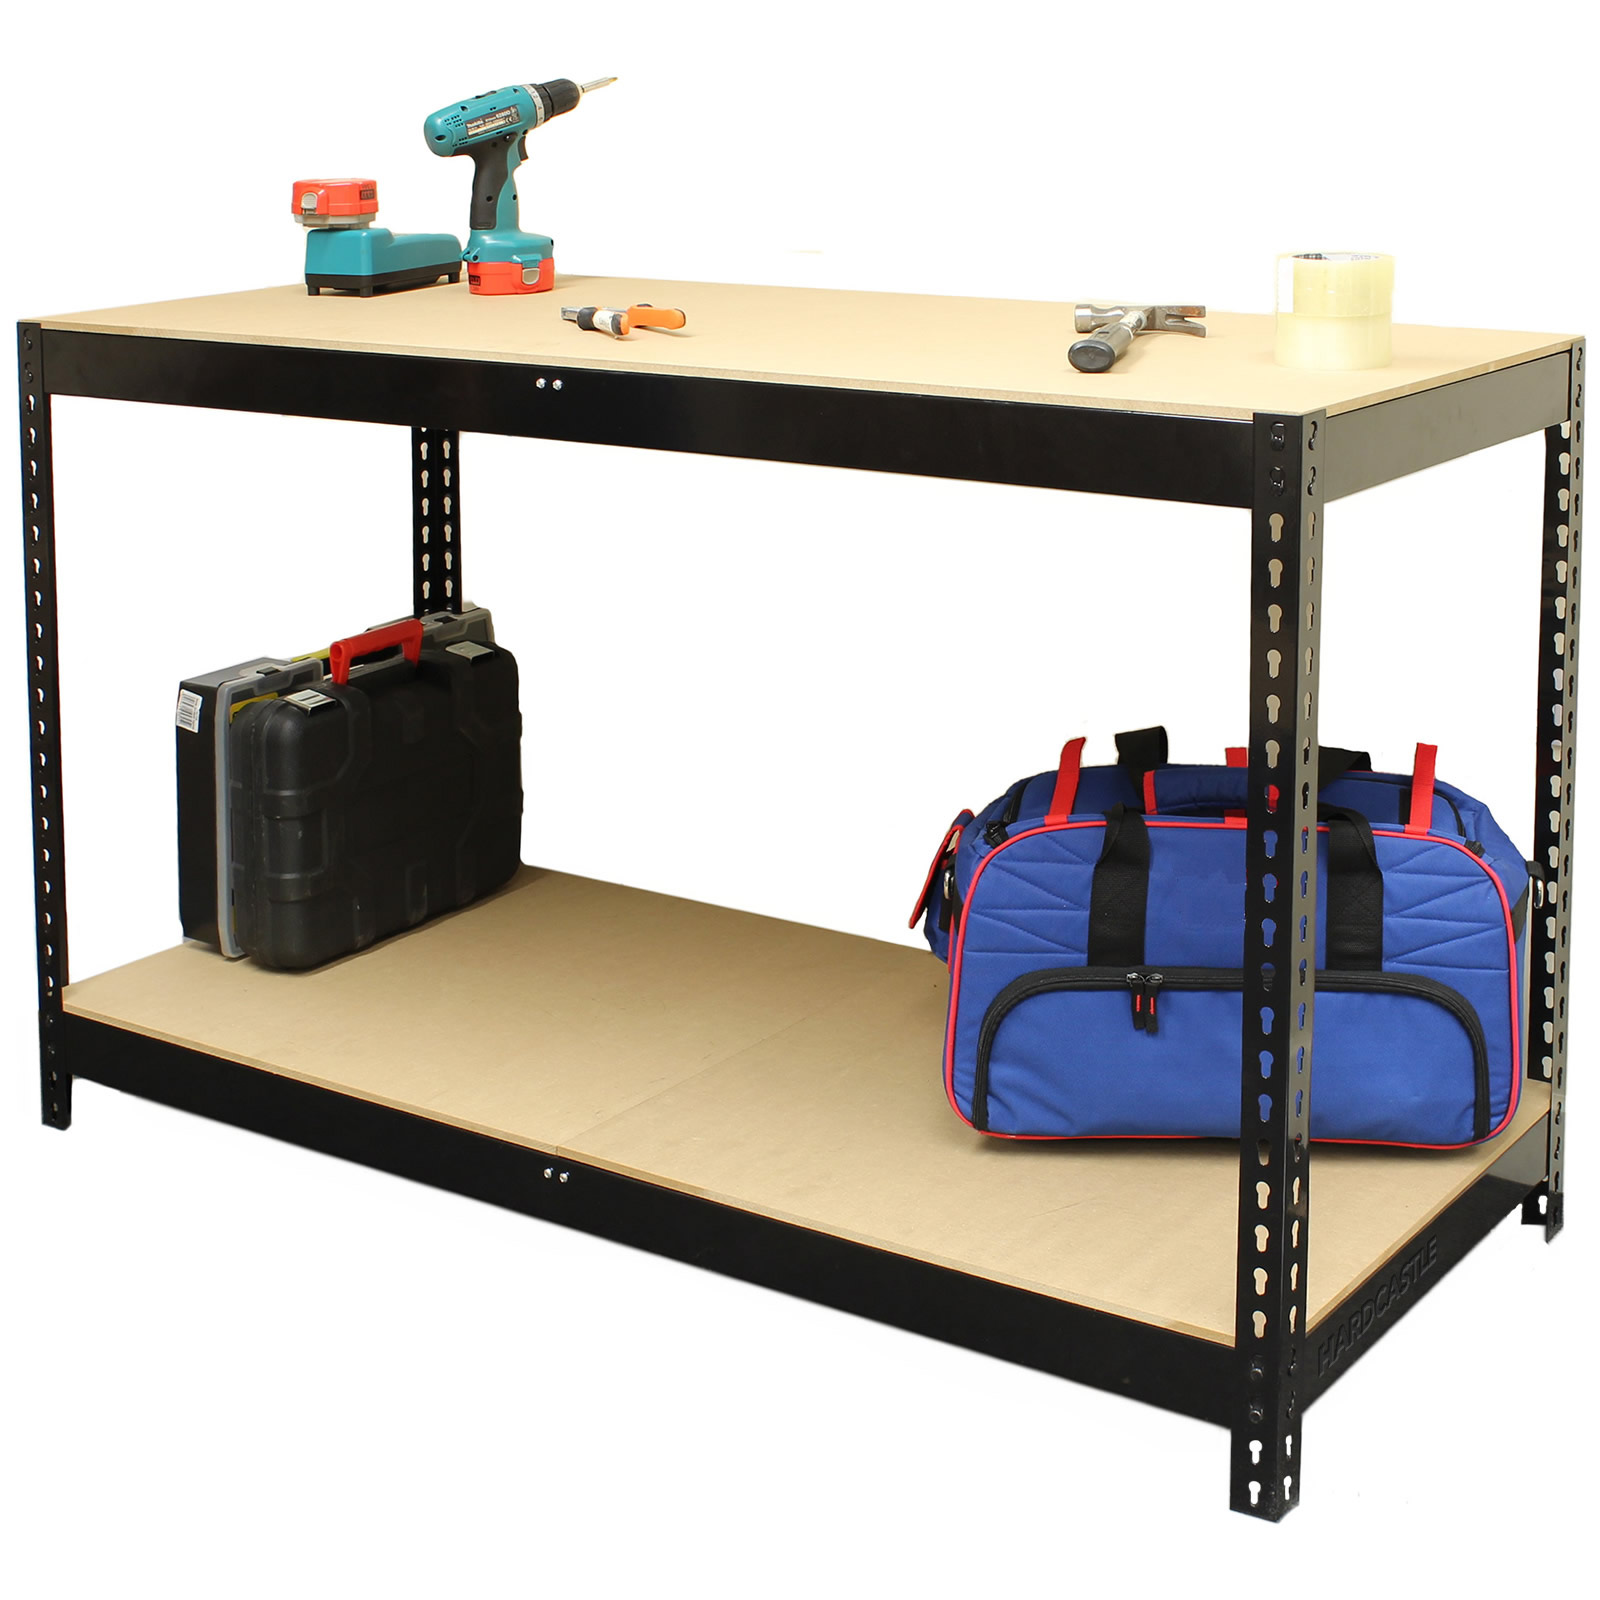 Hardcastle Black Steel Garage Warehouse Workbench Table